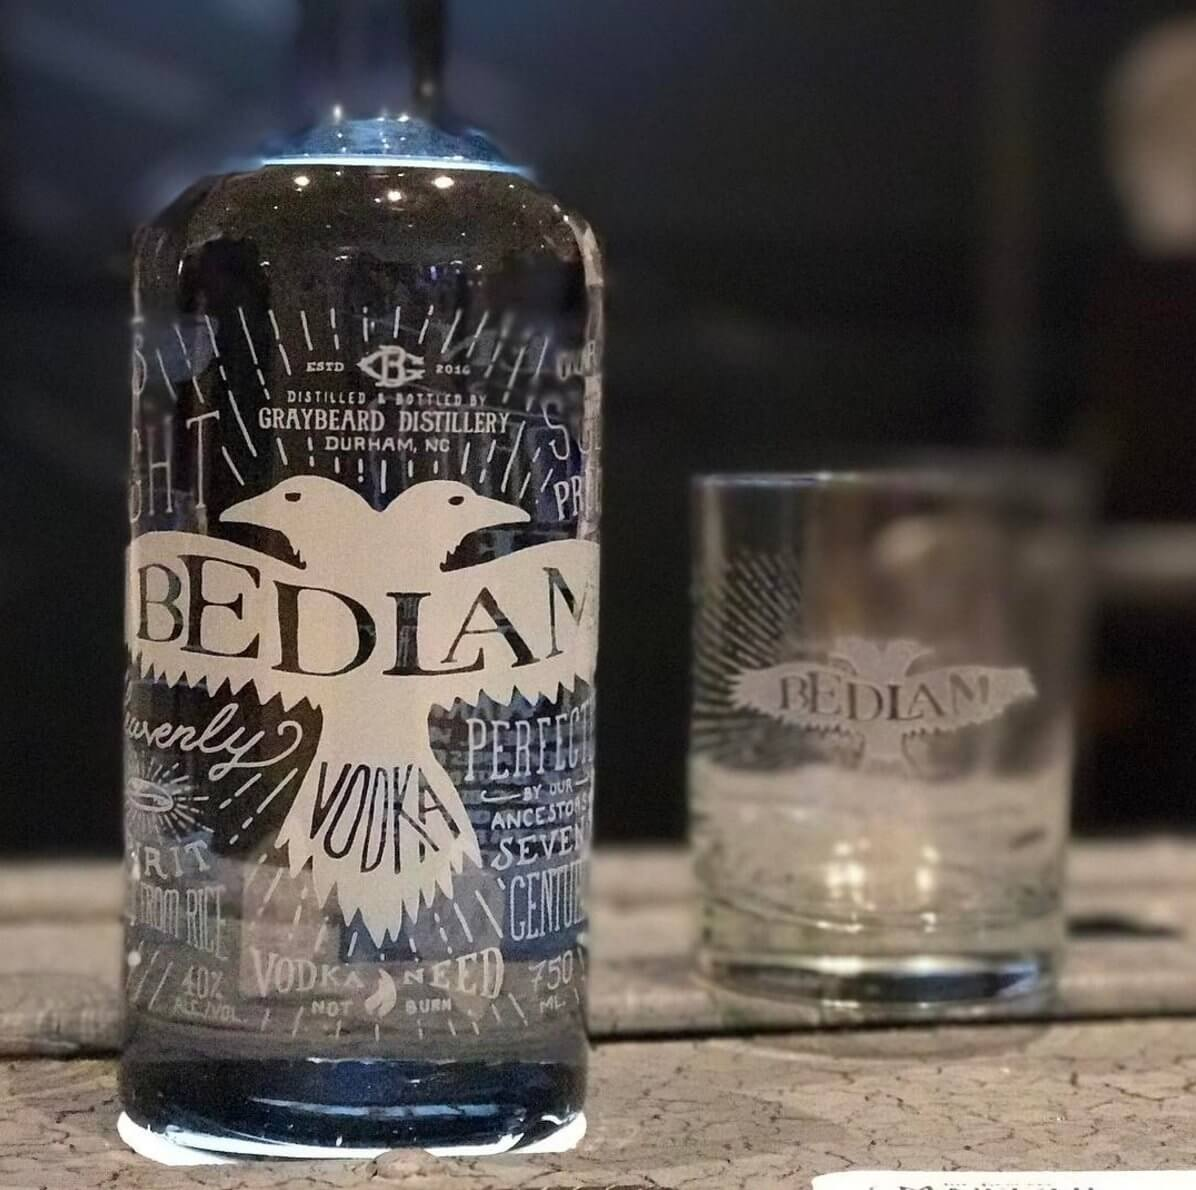 Graybeard Distillery Bedlam Vodka wins at WSWA - What's Shakin' week of May 8, 2017